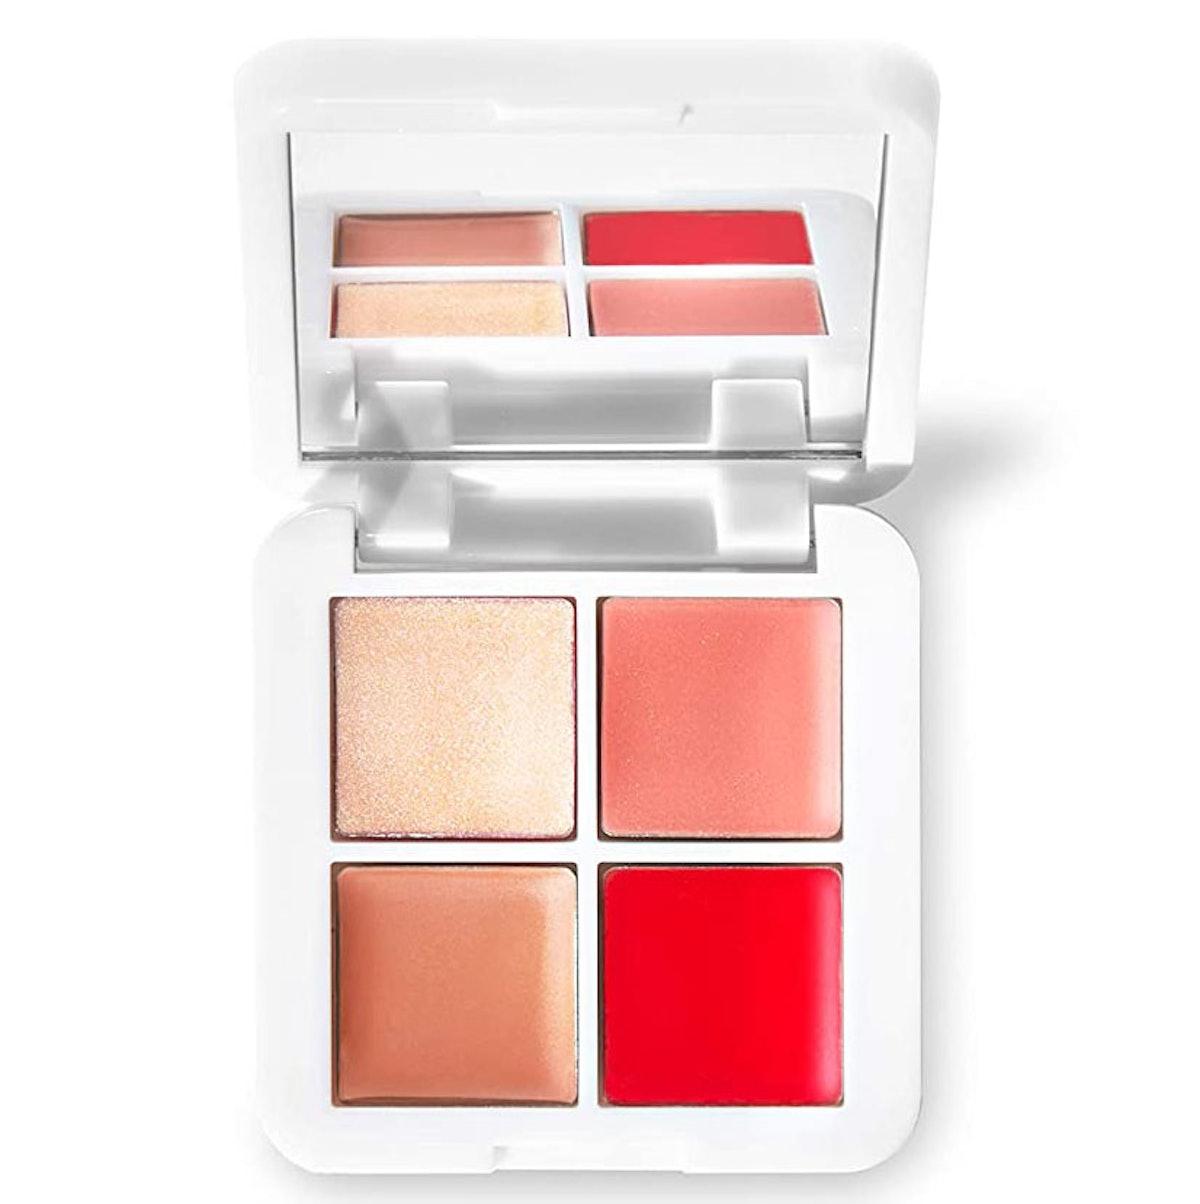 RMS Beauty Lip2Cheek Glow Quad Mini Palette